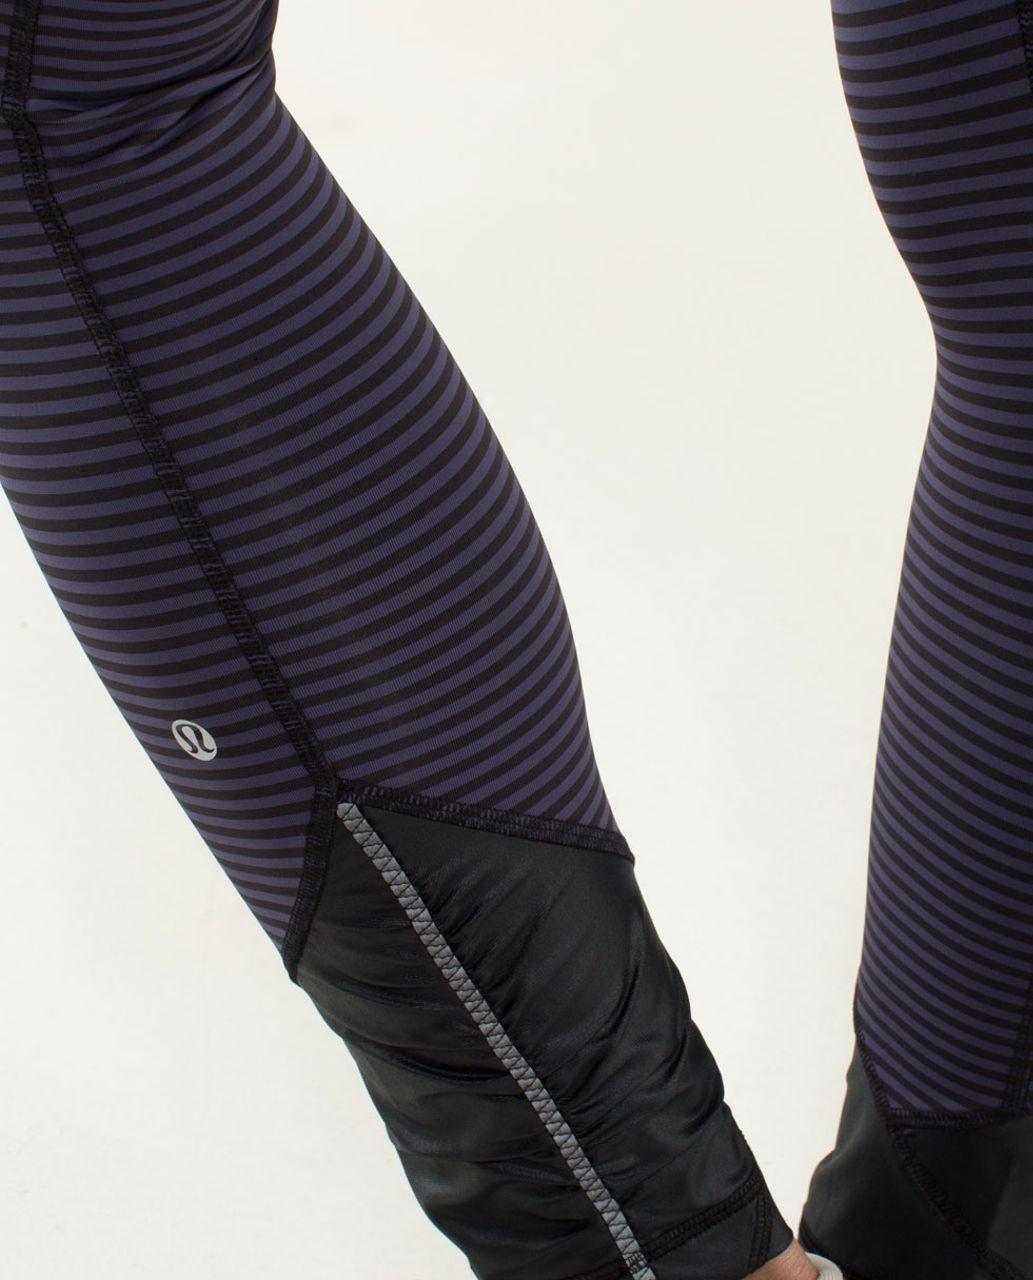 Lululemon Pace Queen Tight - 1 / 8 Stripe Cadet Blue / Black / Cadet Blue